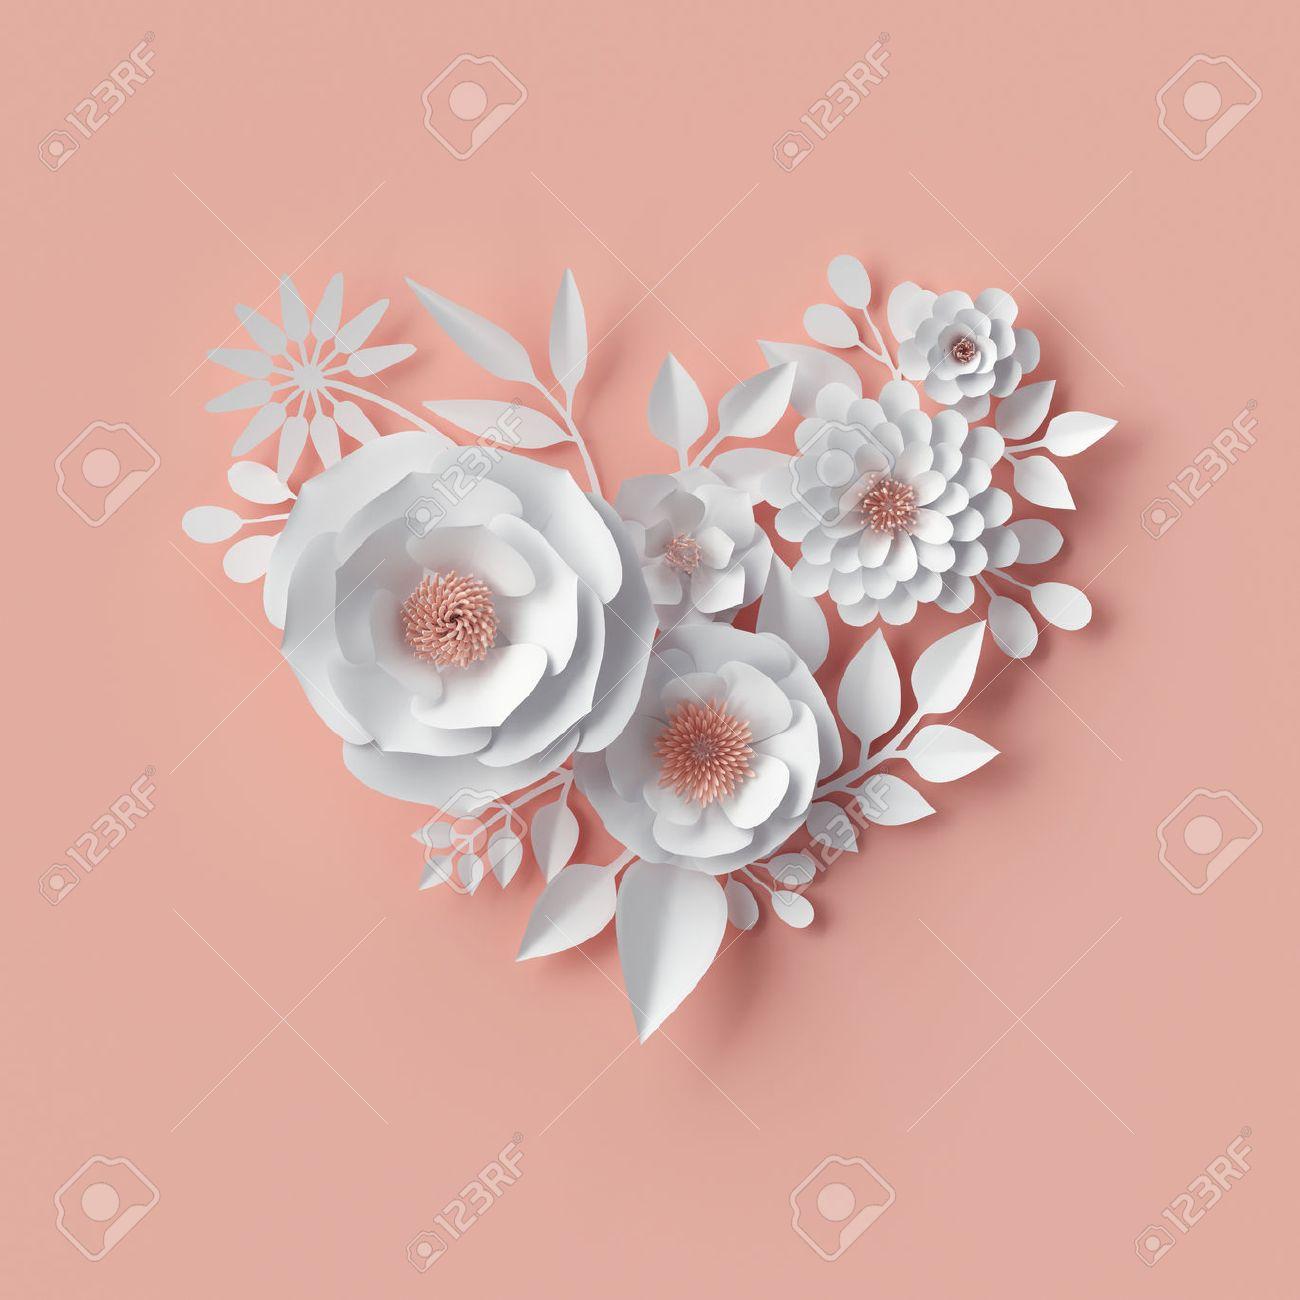 3d render digital illustration white paper flowers blush pink 3d render digital illustration white paper flowers blush pink wall decor floral amipublicfo Choice Image